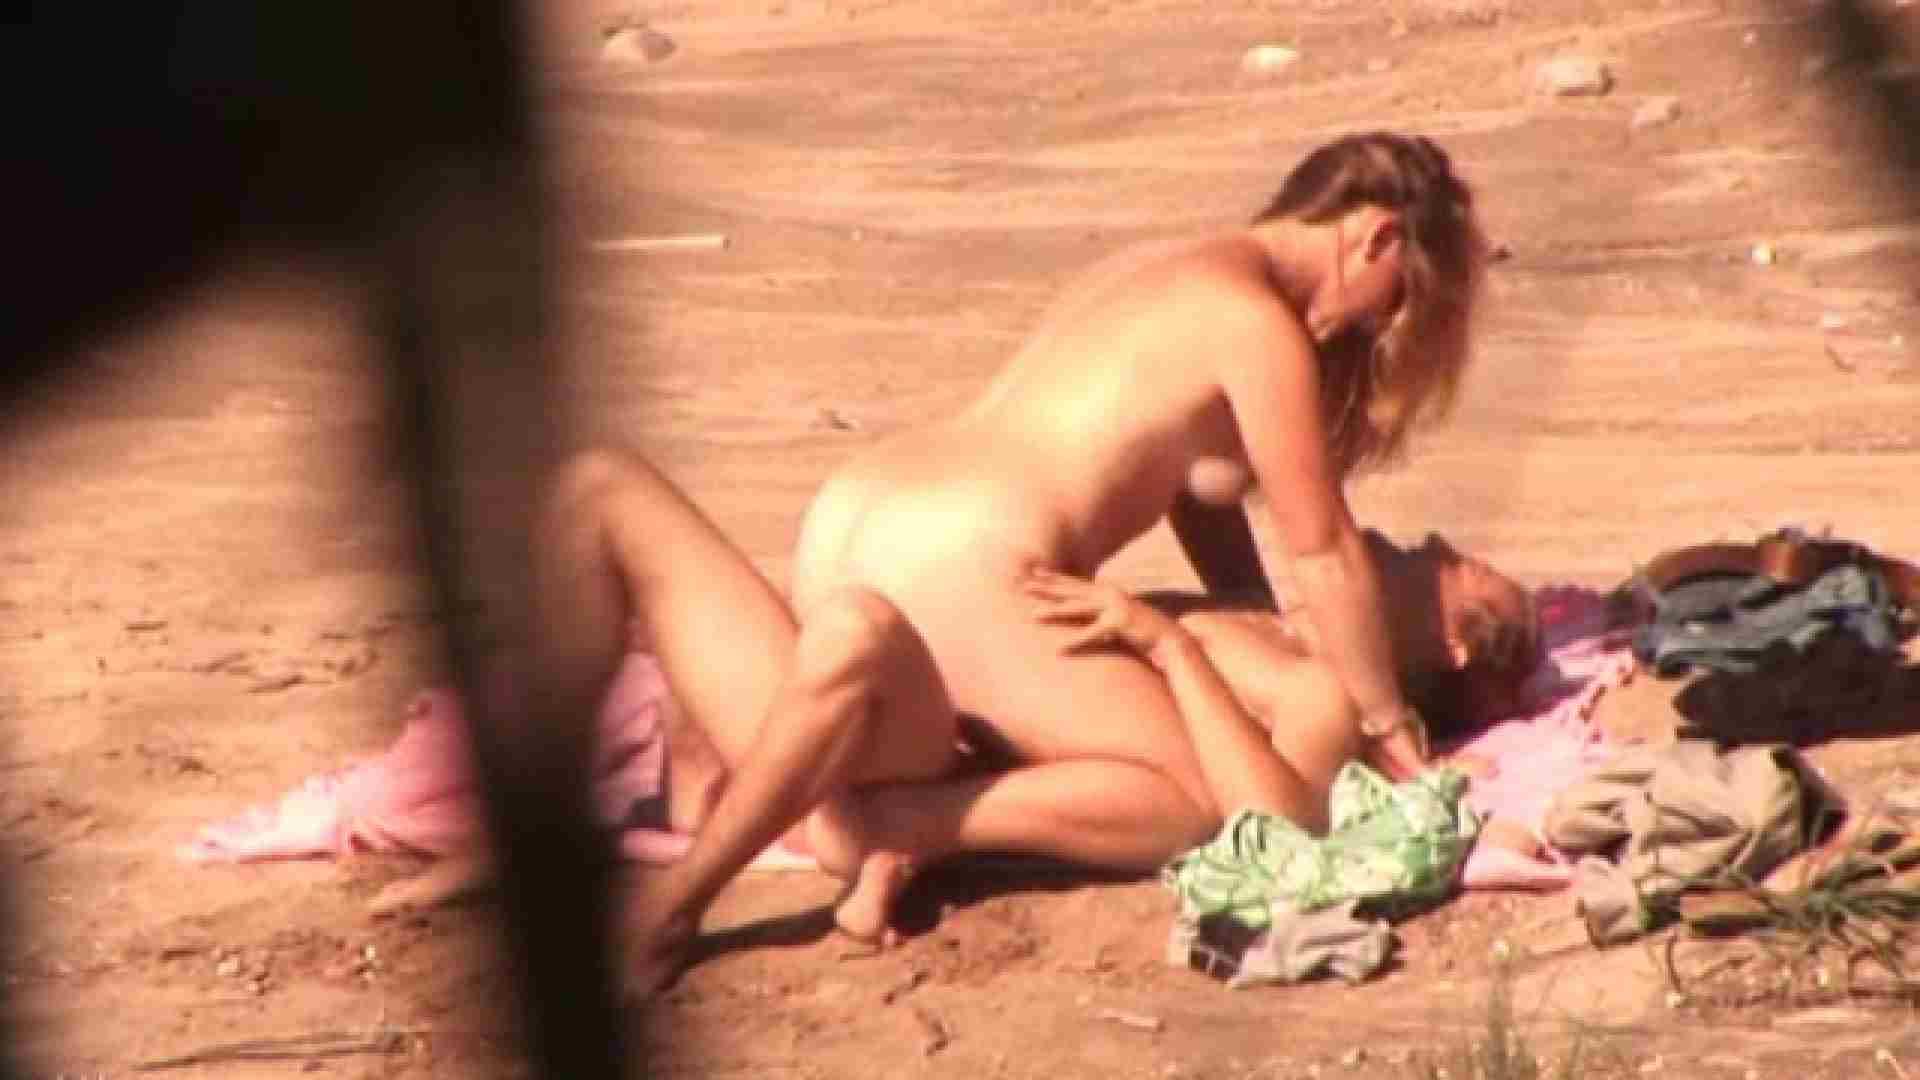 SEX ON THE BEACHvol.9 セックスエロ動画 盗撮画像 94PIX 44